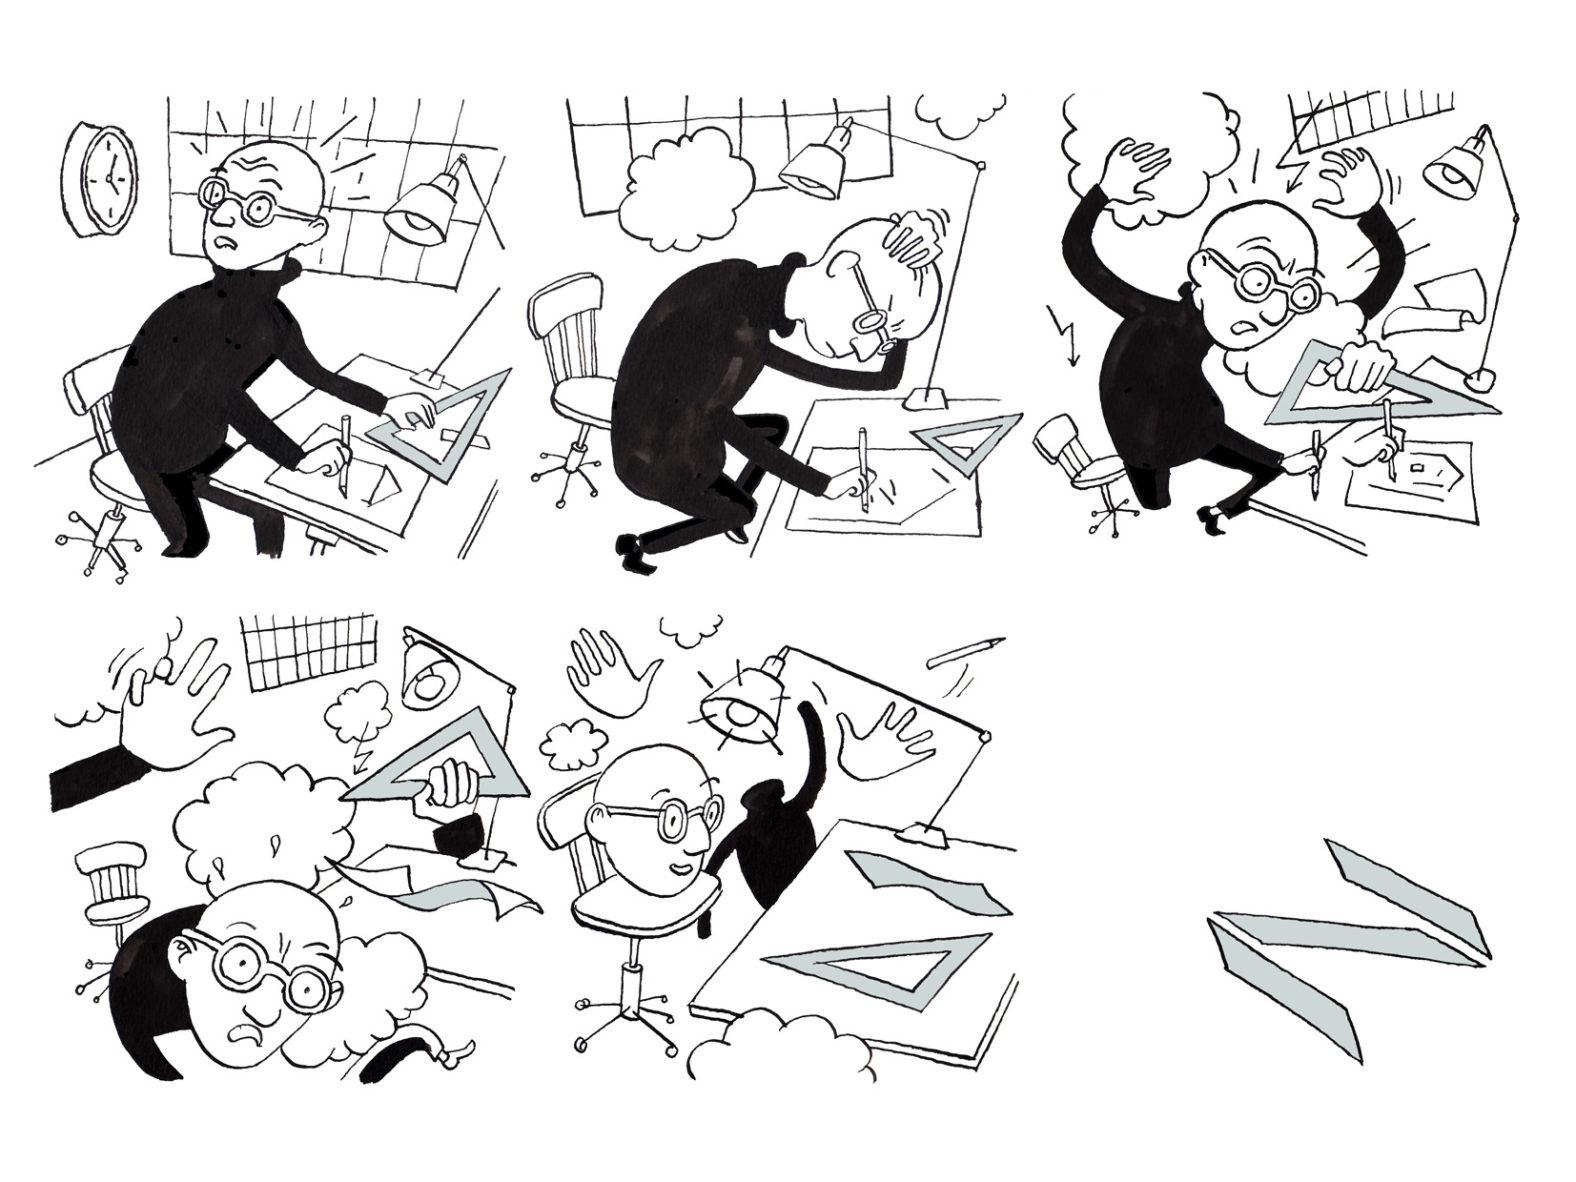 comic © 2014 by gefe